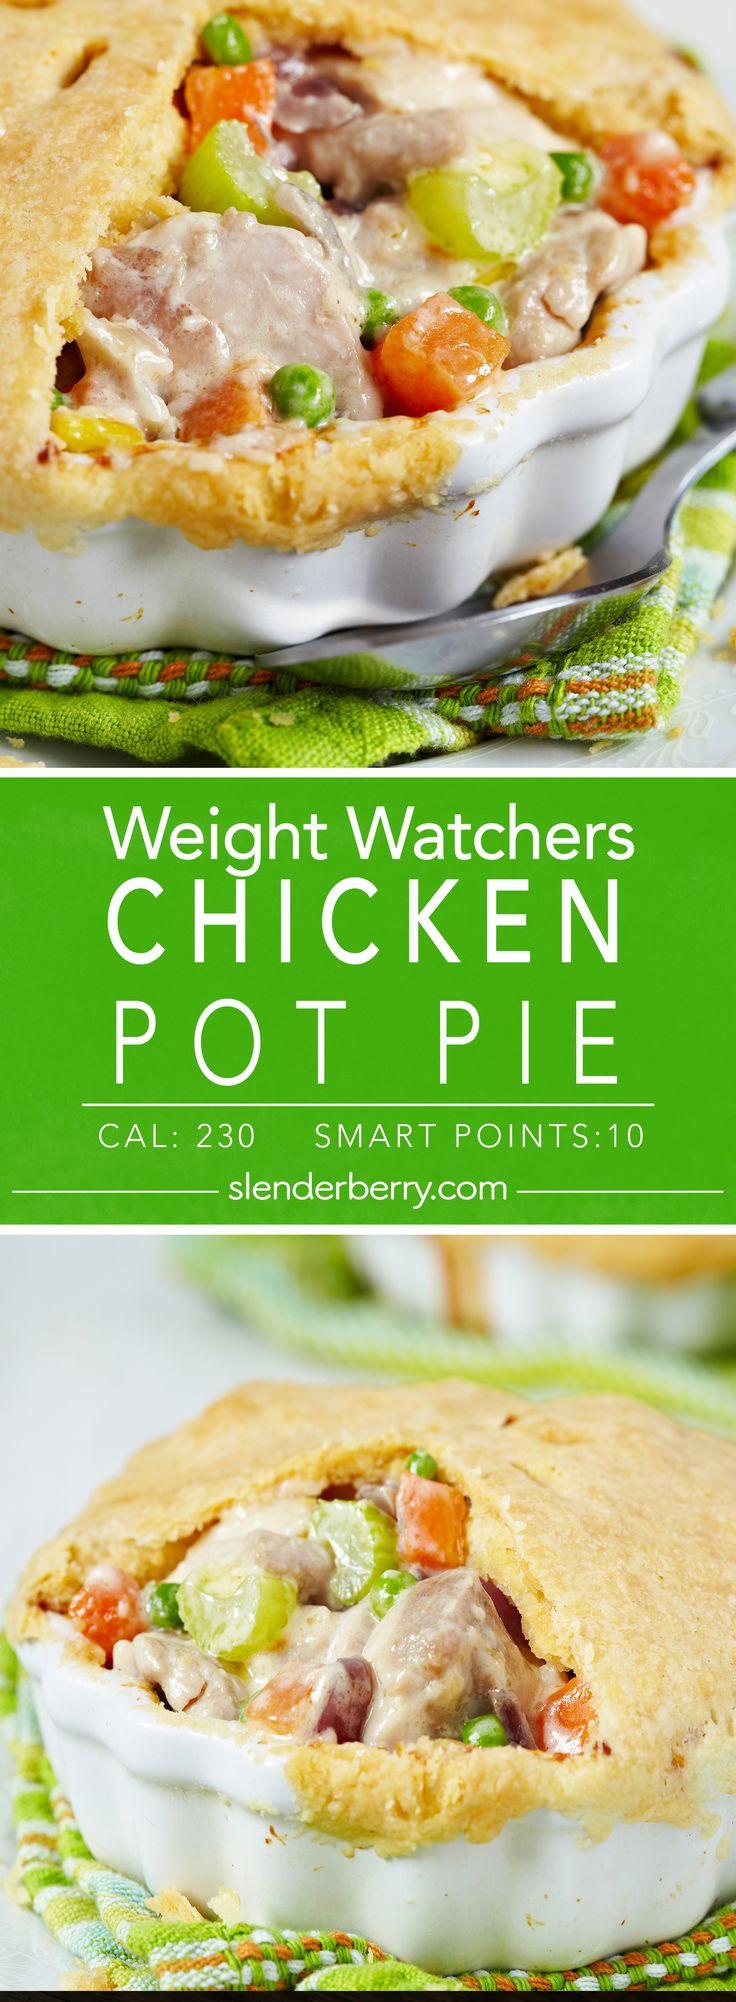 Healthy Chicken Pot Pie Recipe Weight Watchers the 20 Best Ideas for Best Healthy Recipe Ideas Images On Pinterest